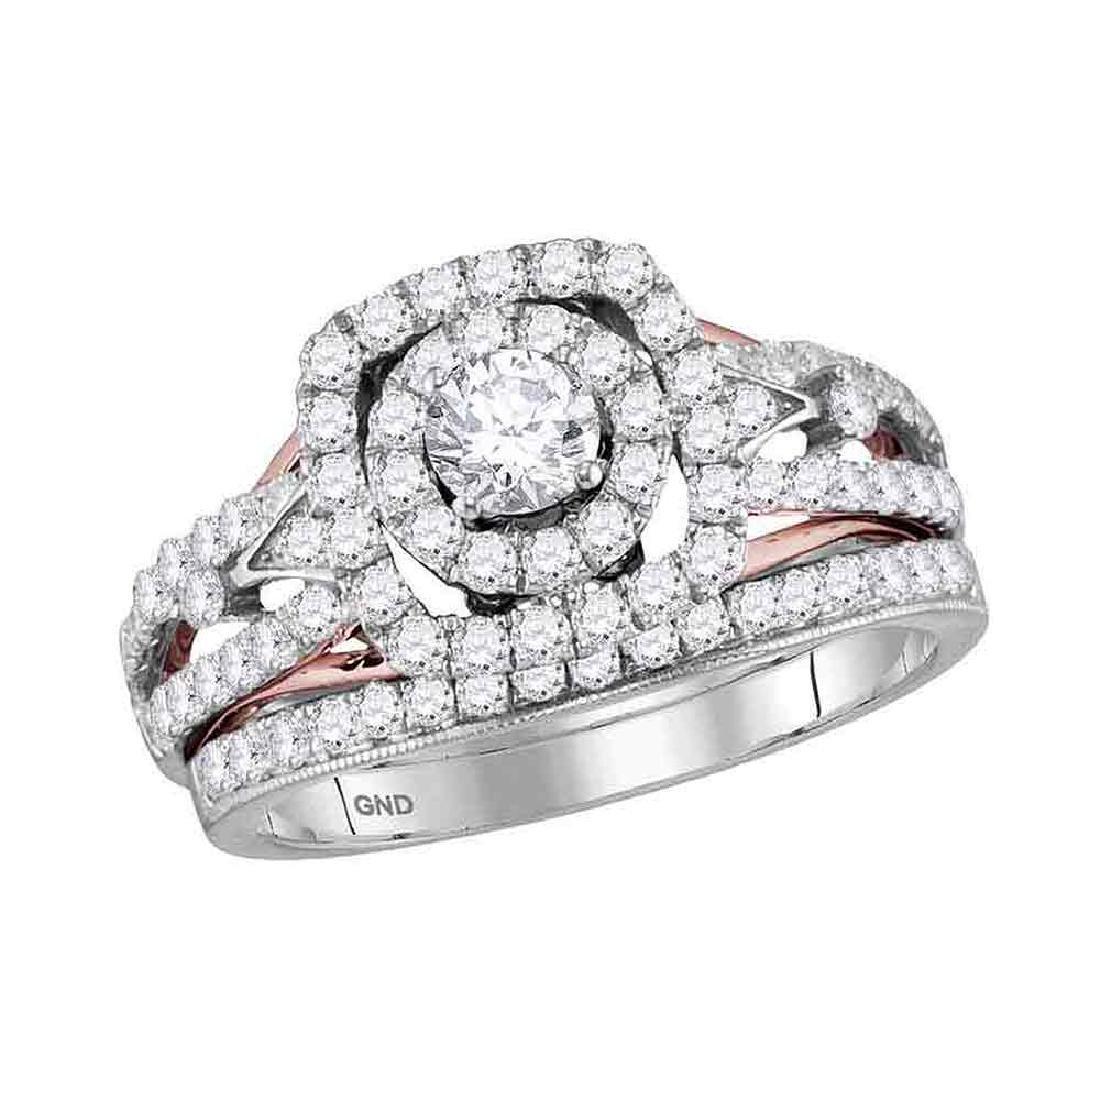 1.2 CTW Diamond Bridal Wedding Engagement Ring 14KT